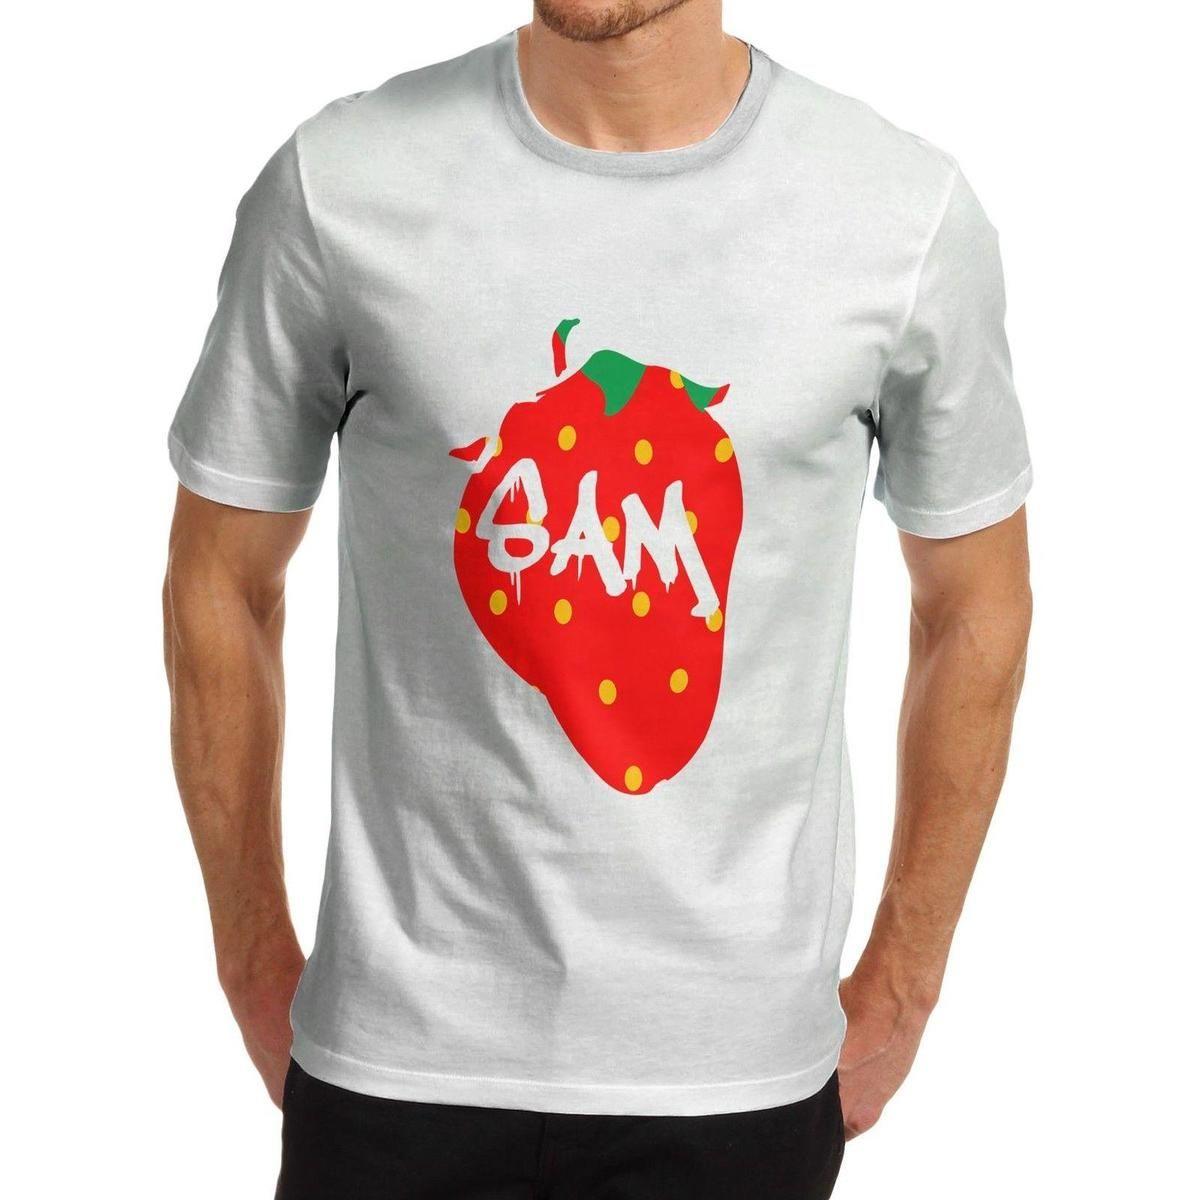 Compre Camiseta Personalizada Para Hombre De Fruit Strawberry Novelty A   11.87 Del Liguo0031  a448190fff546